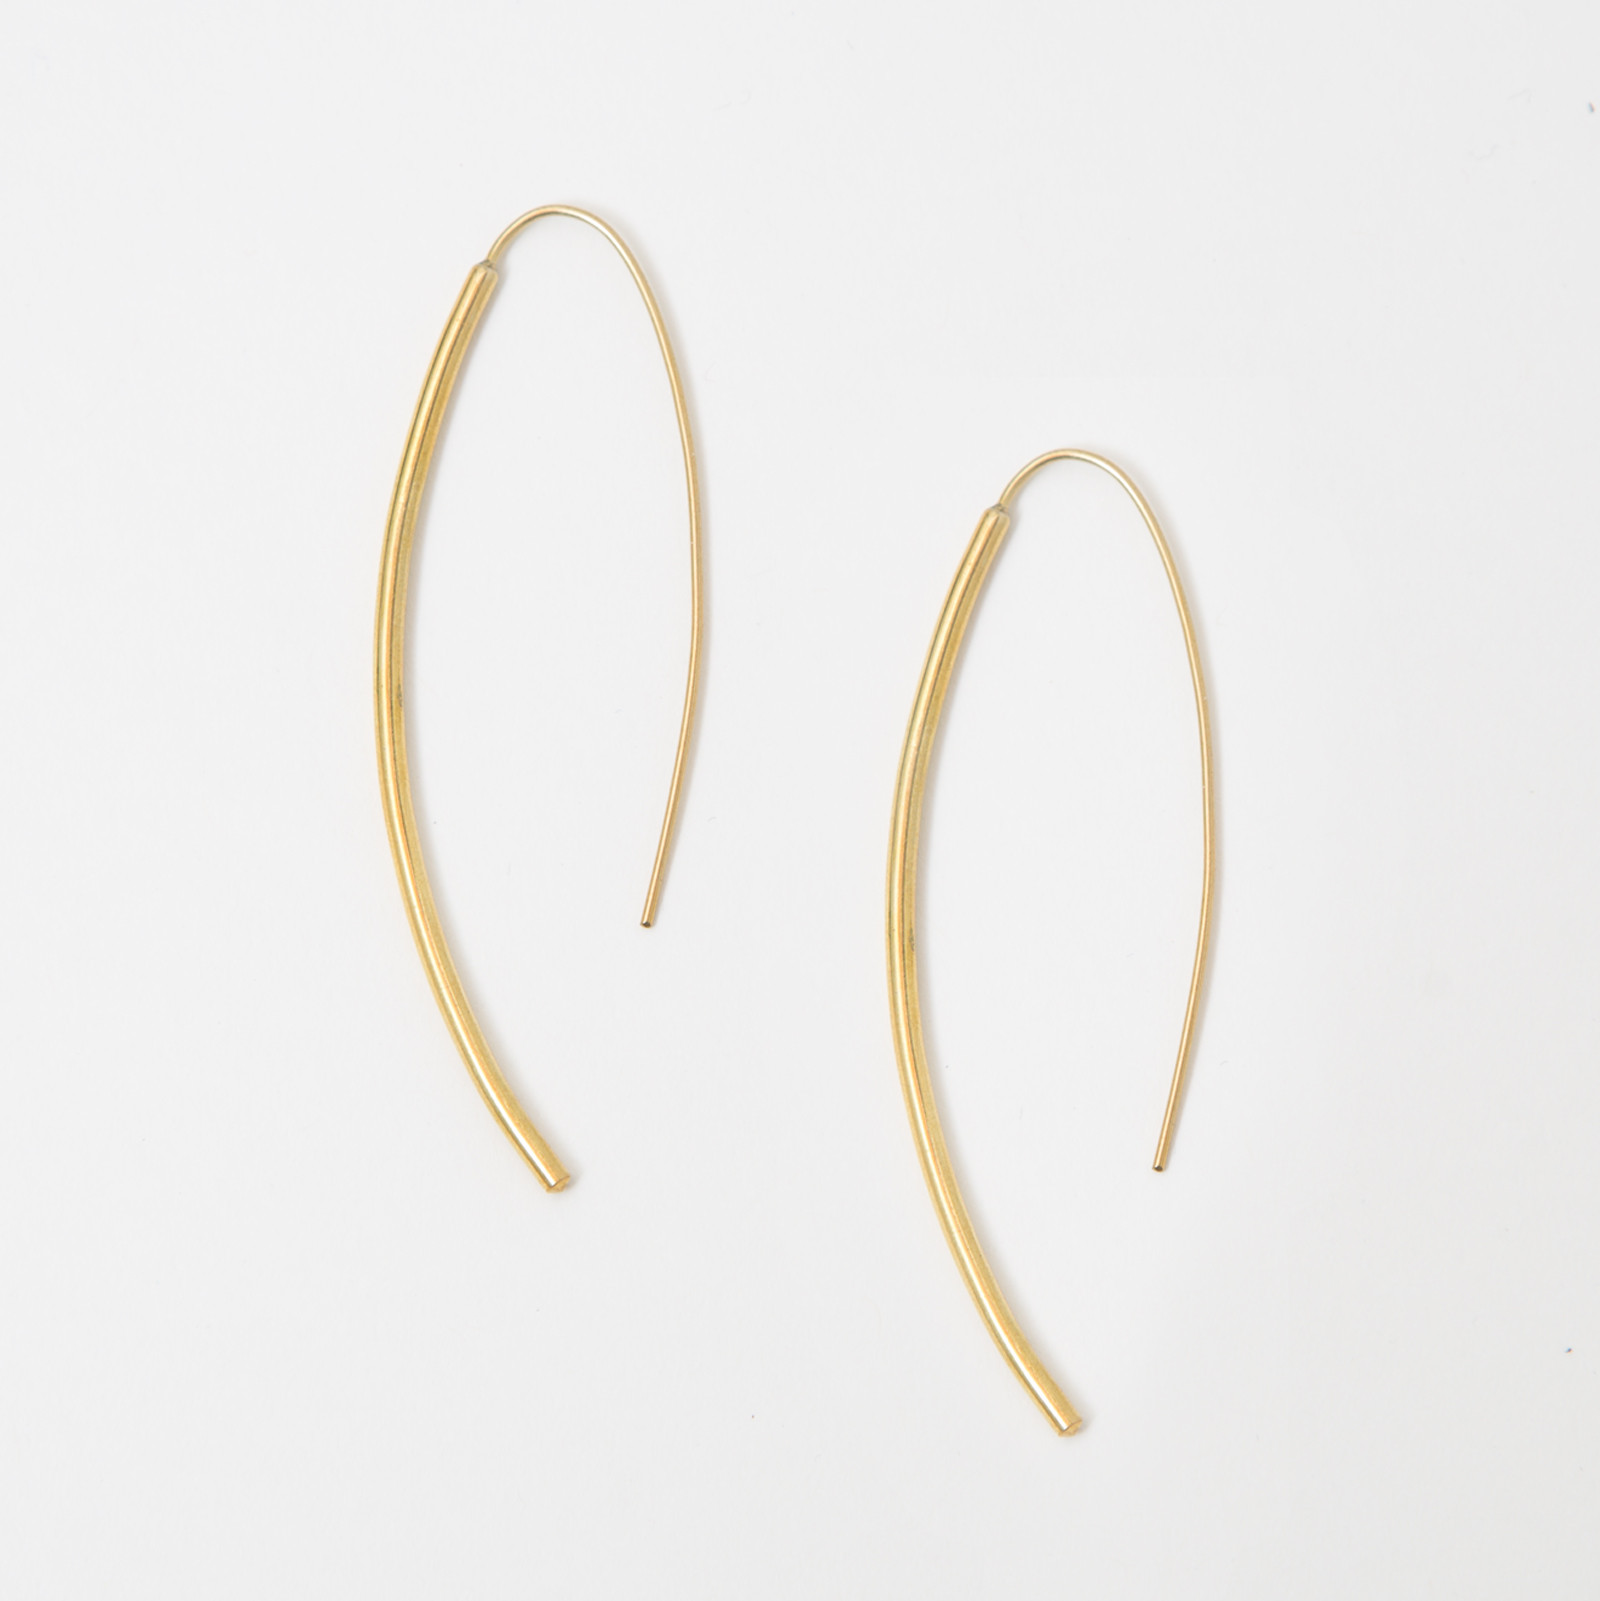 Bow Earrings, $48   Photo via shopsoko.com